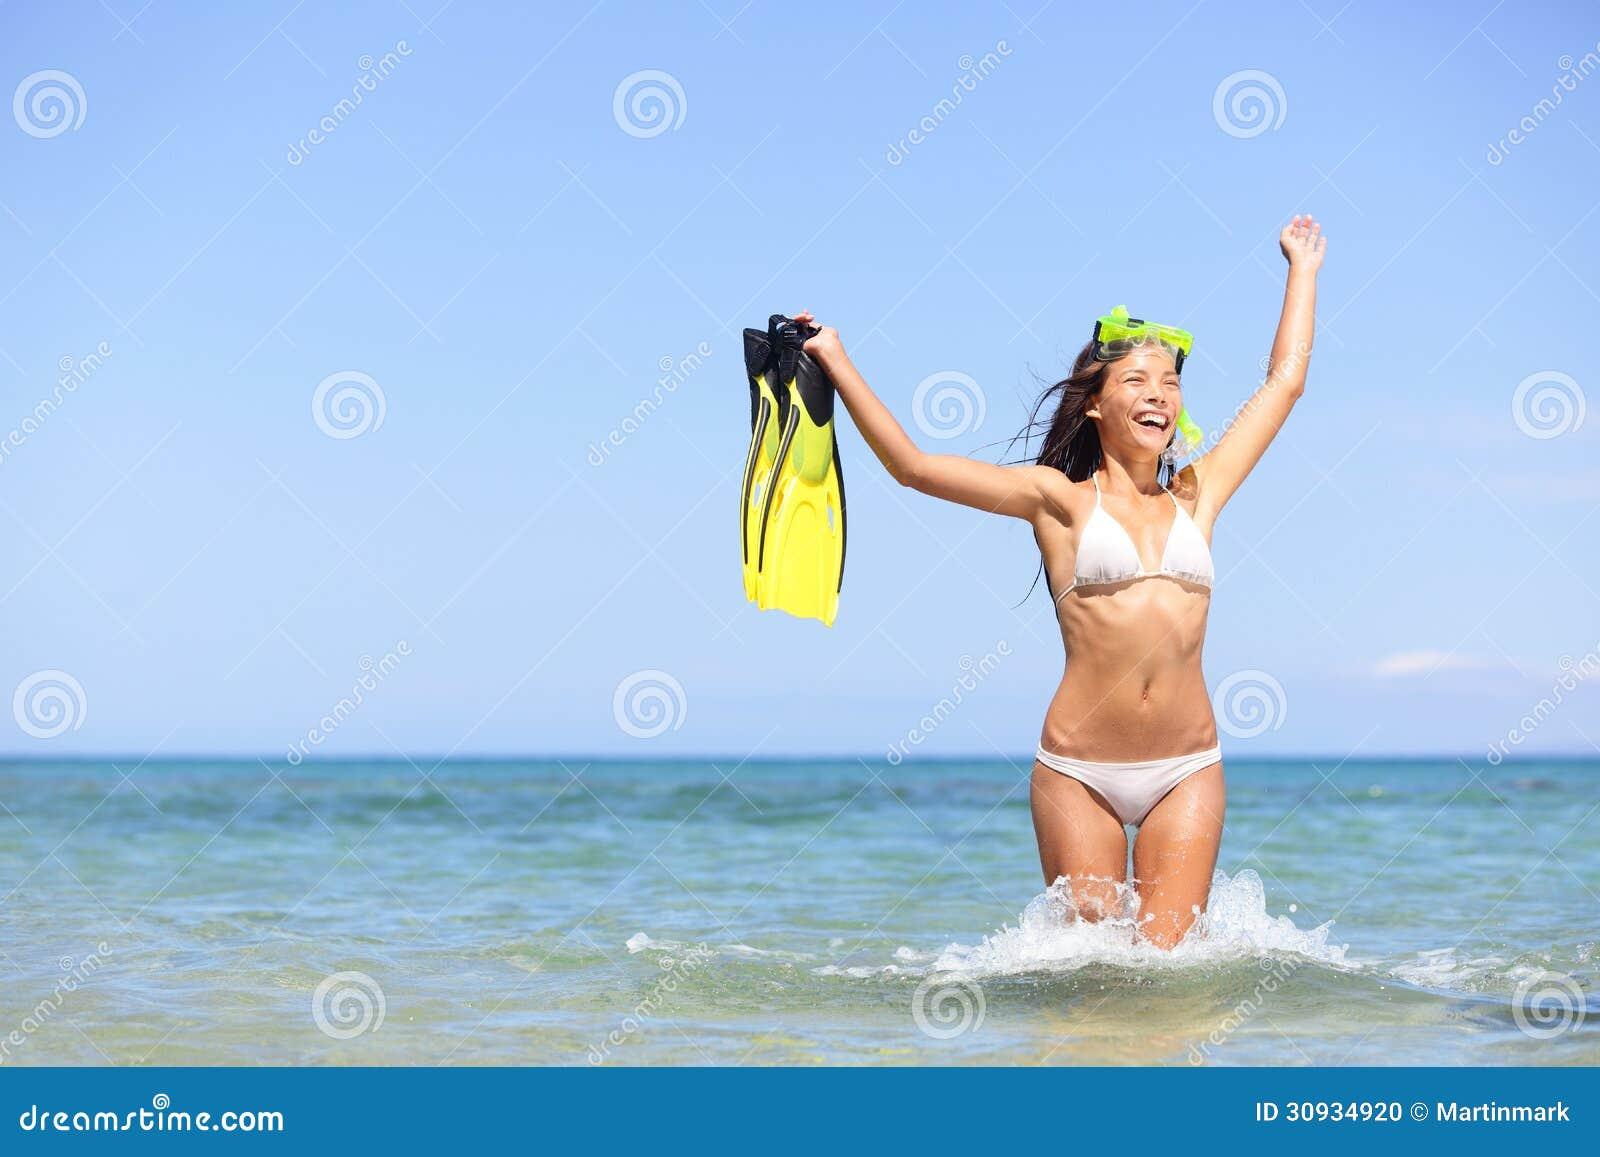 Beach Boys Surfer Girl Little Deuce Coupe